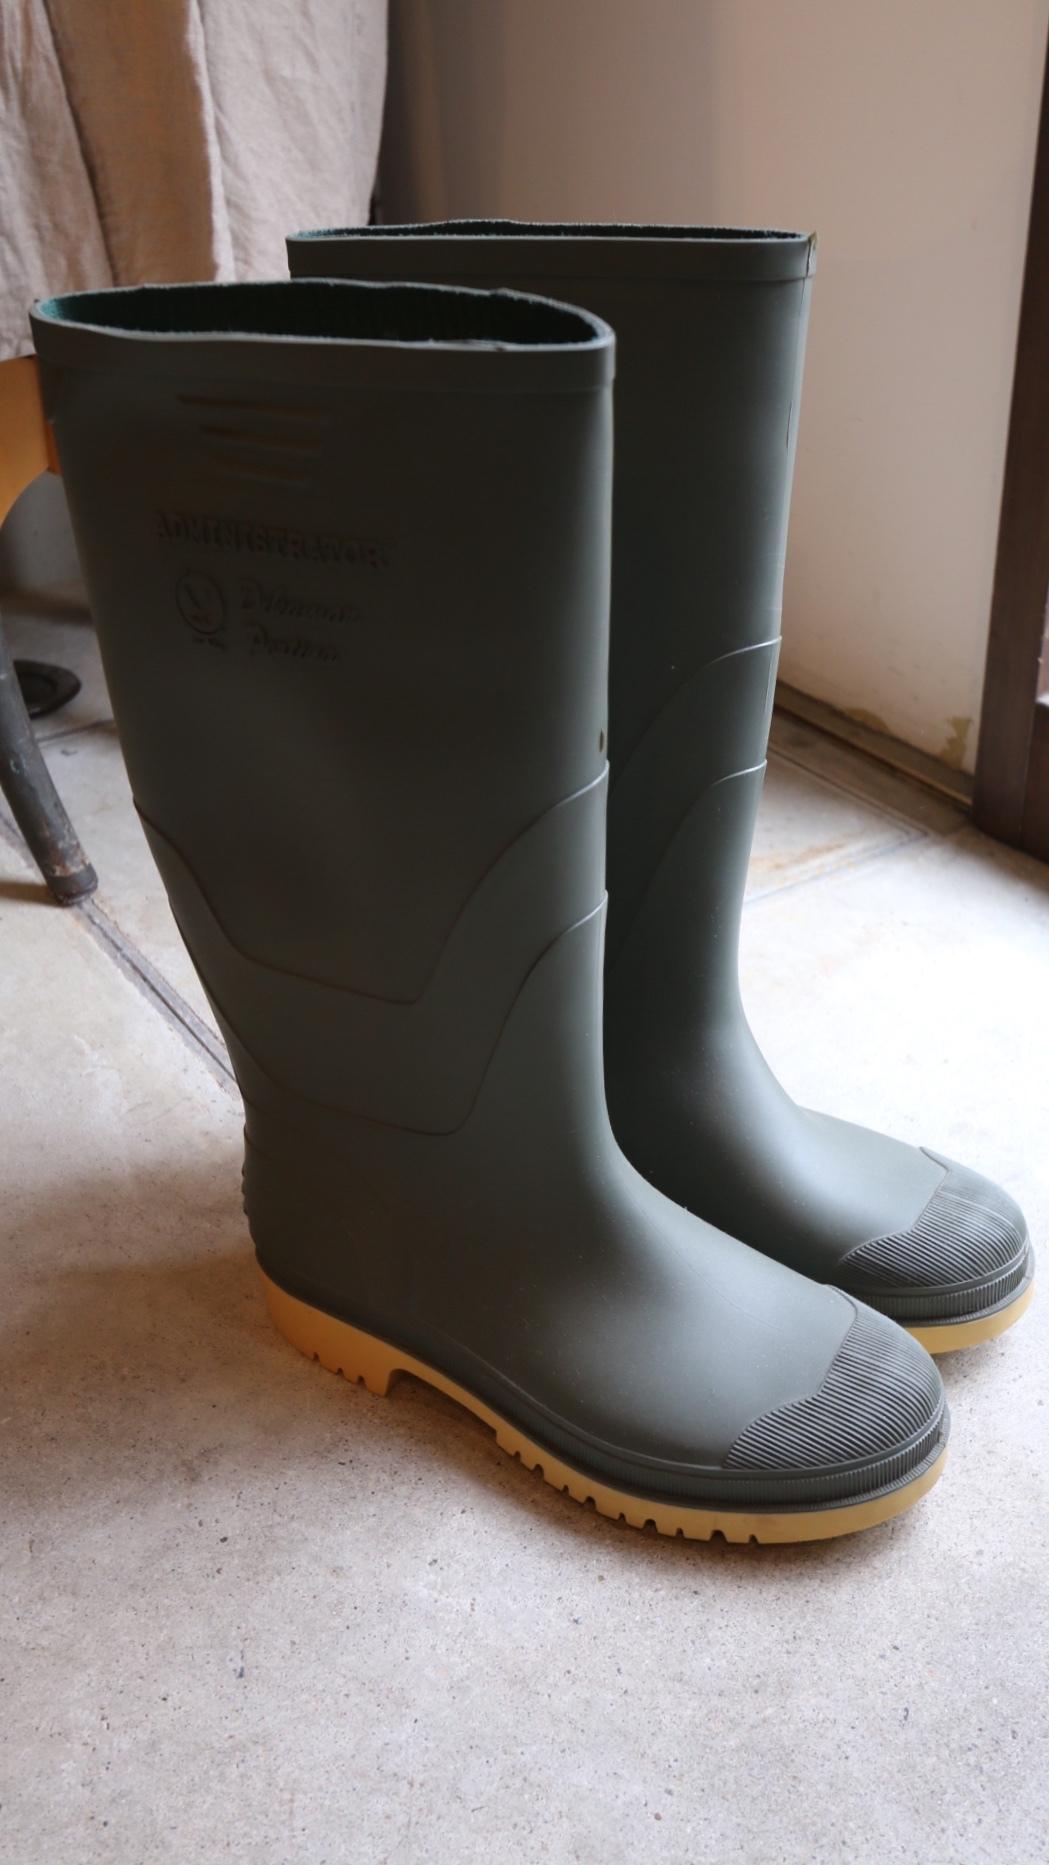 DIKAMAR レインブーツ wellinton boots